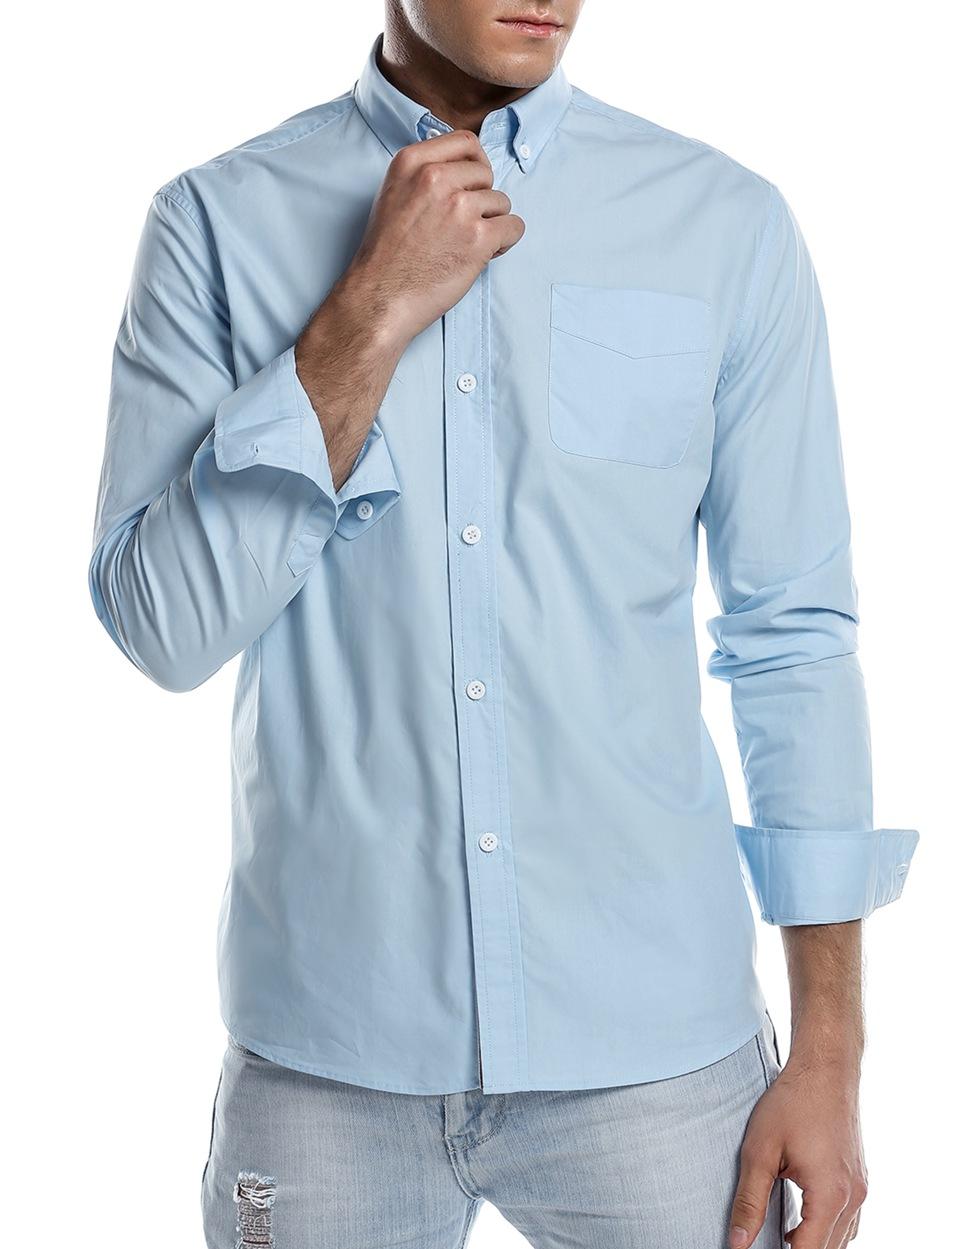 shirt (21)